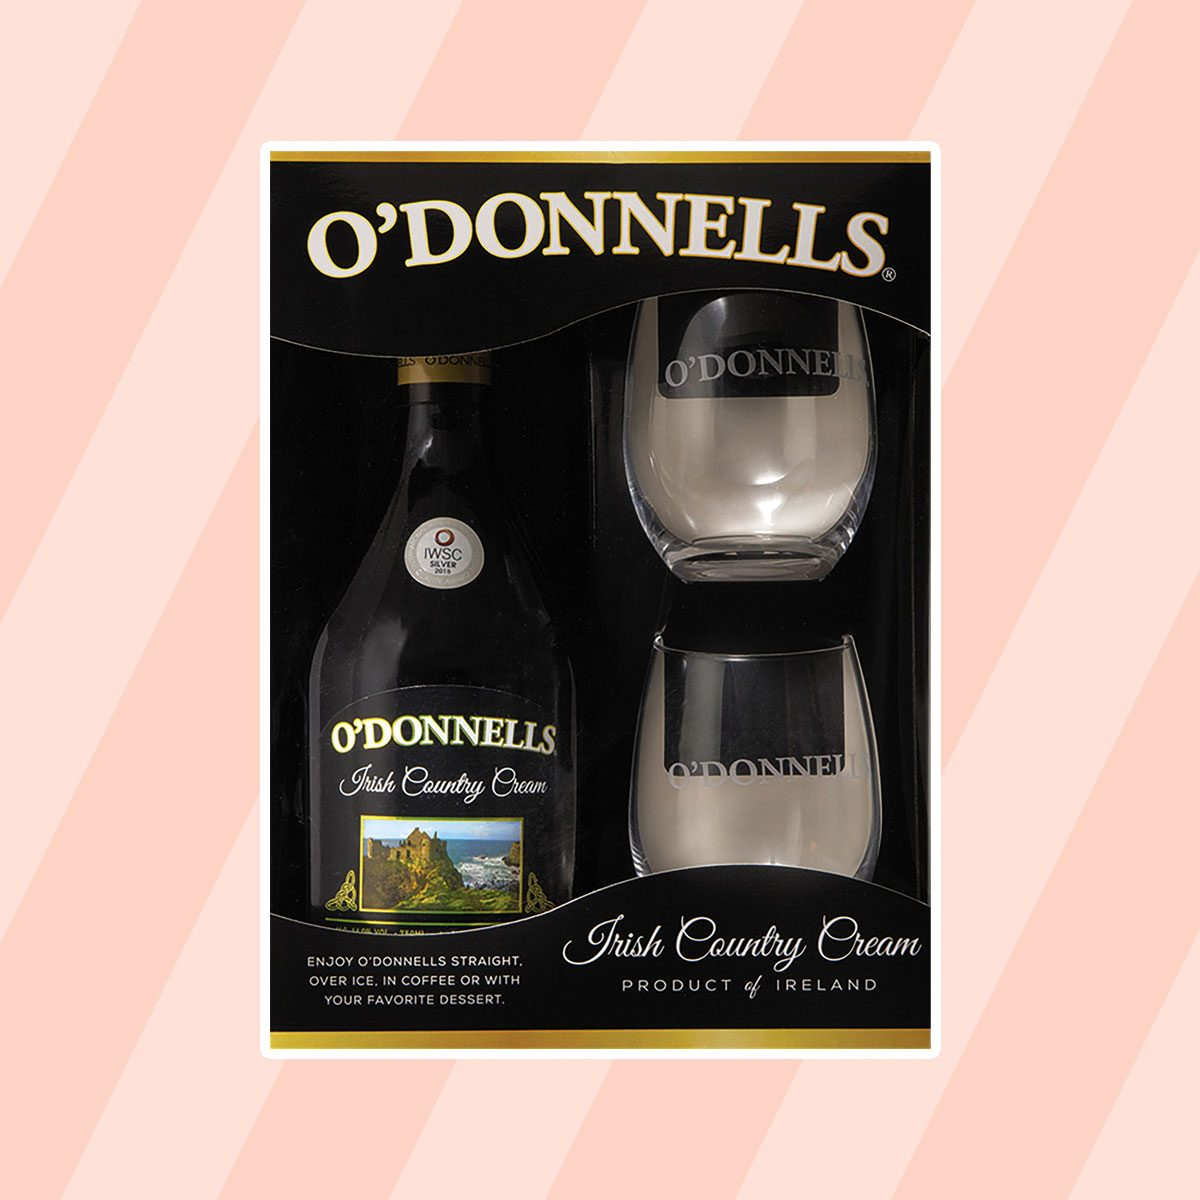 O'Donnells Irish Cream Gift Pack